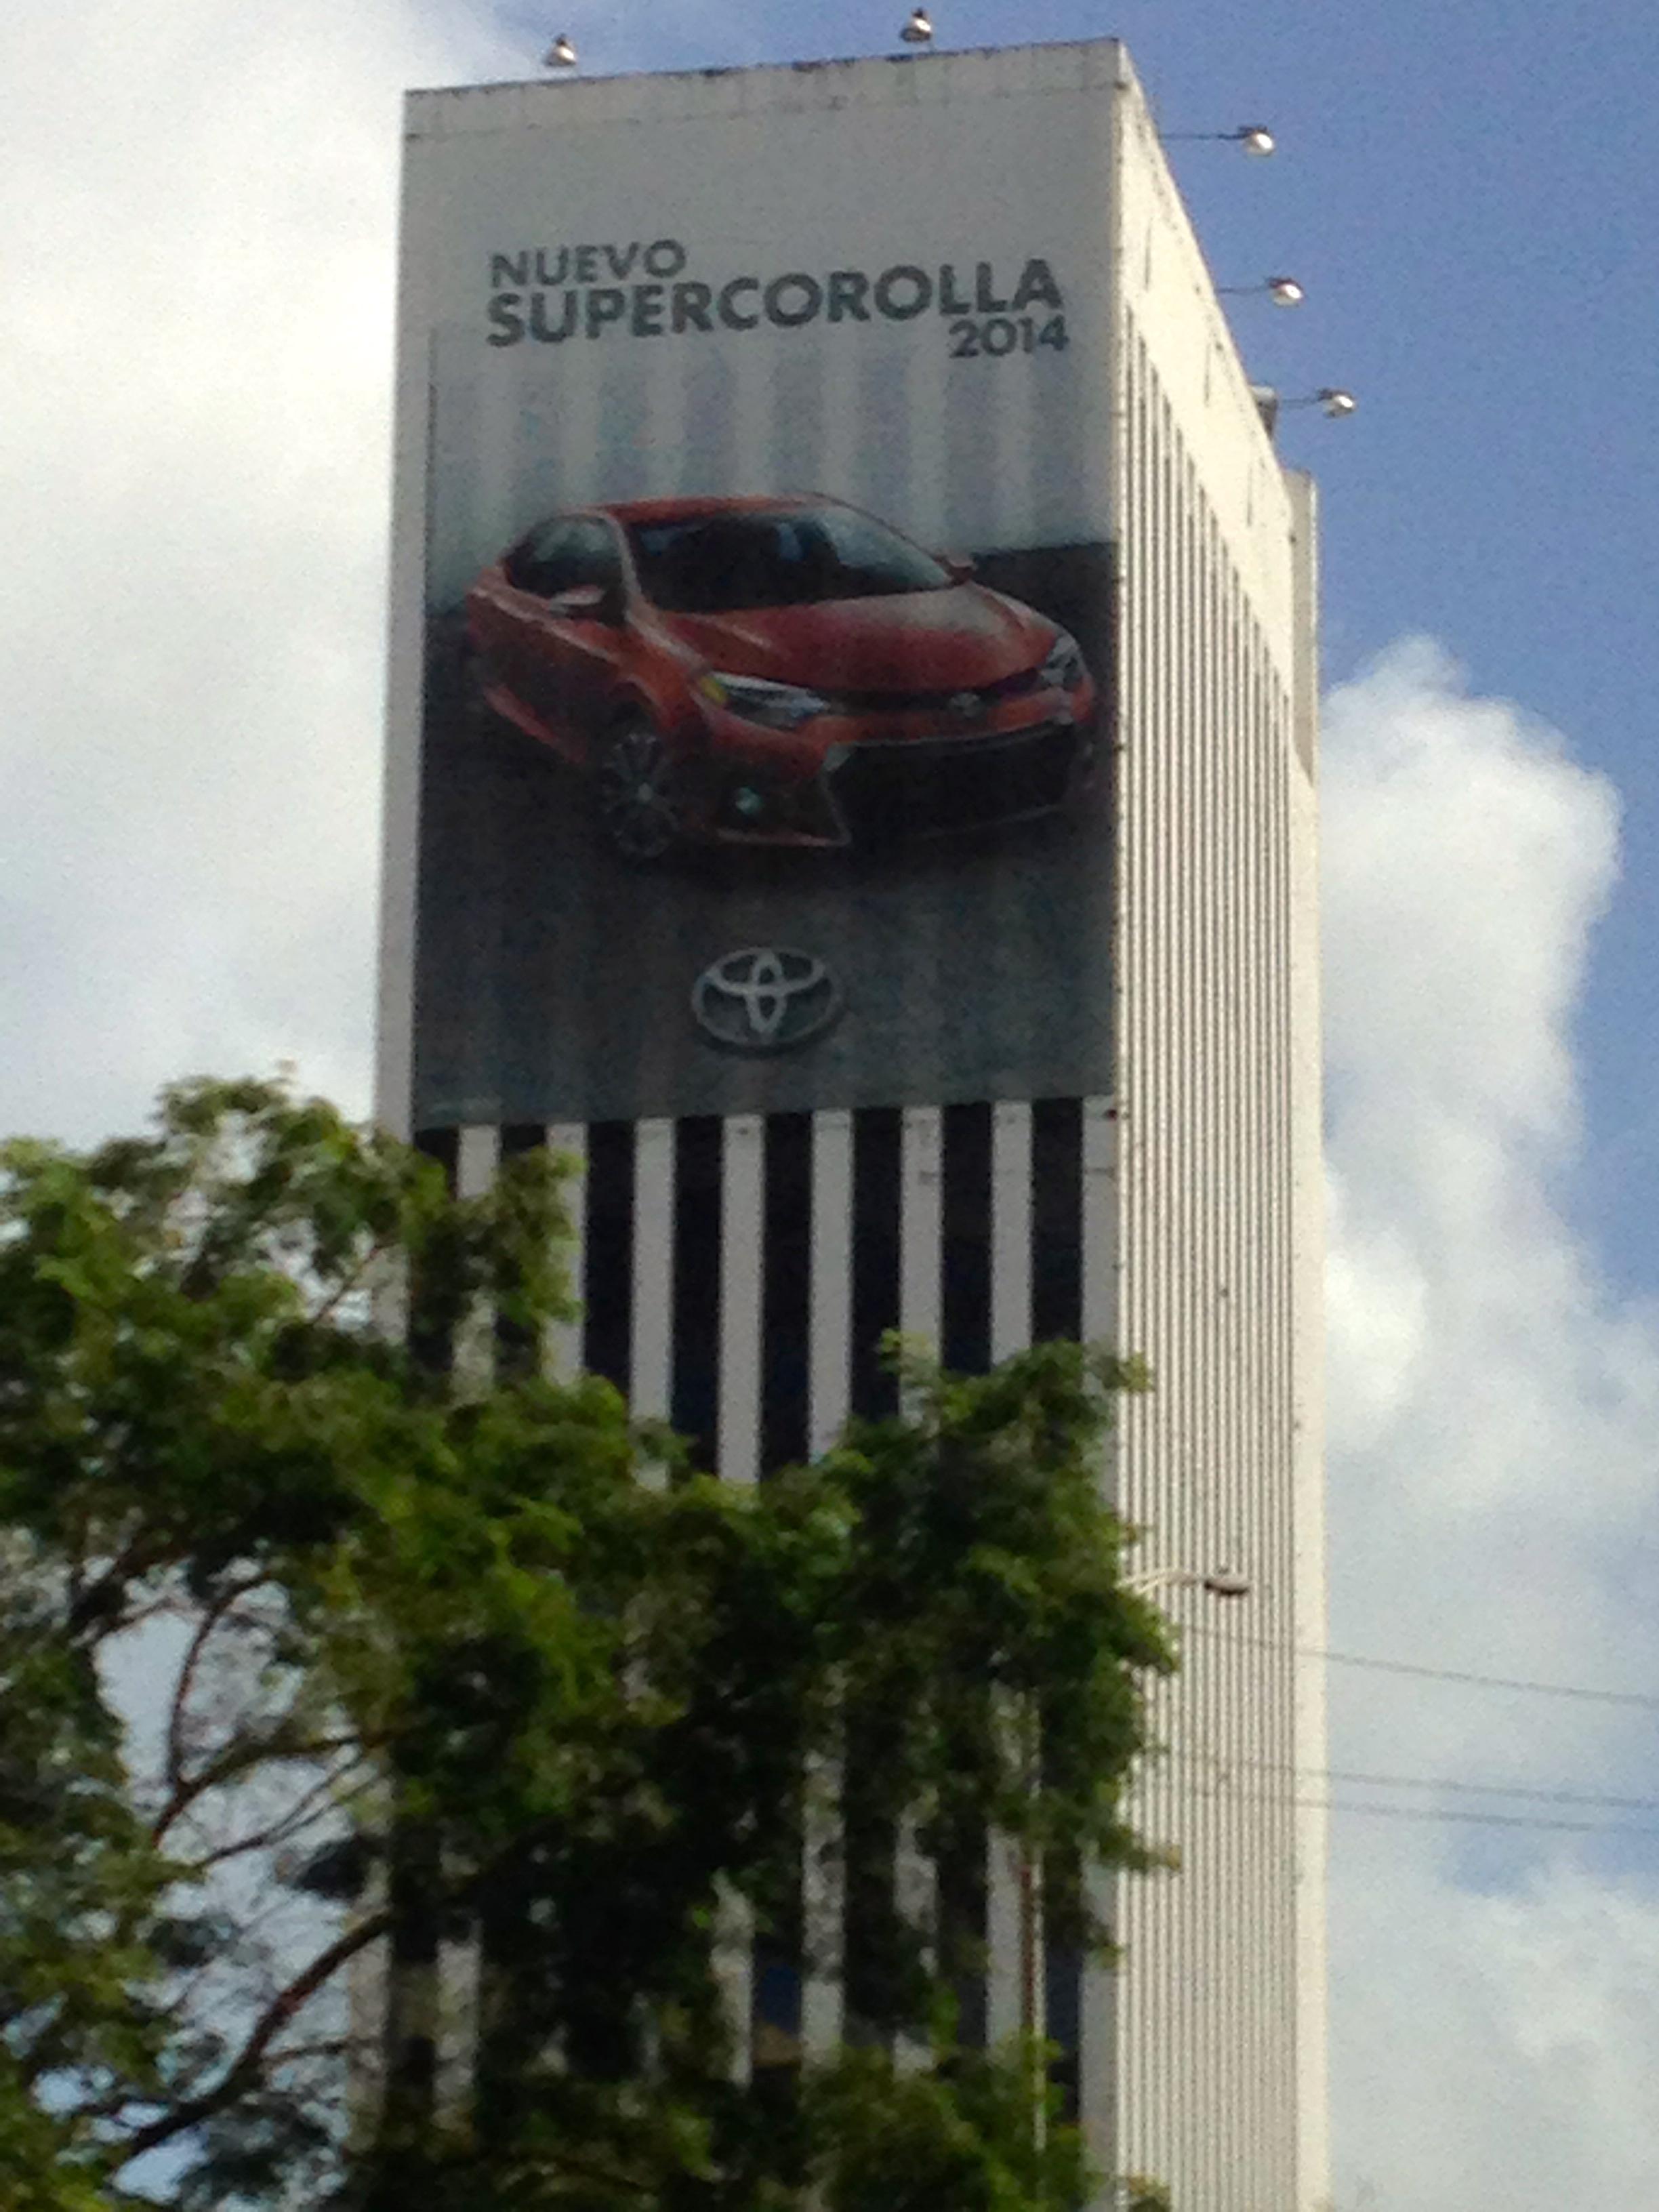 Full Supercorolla